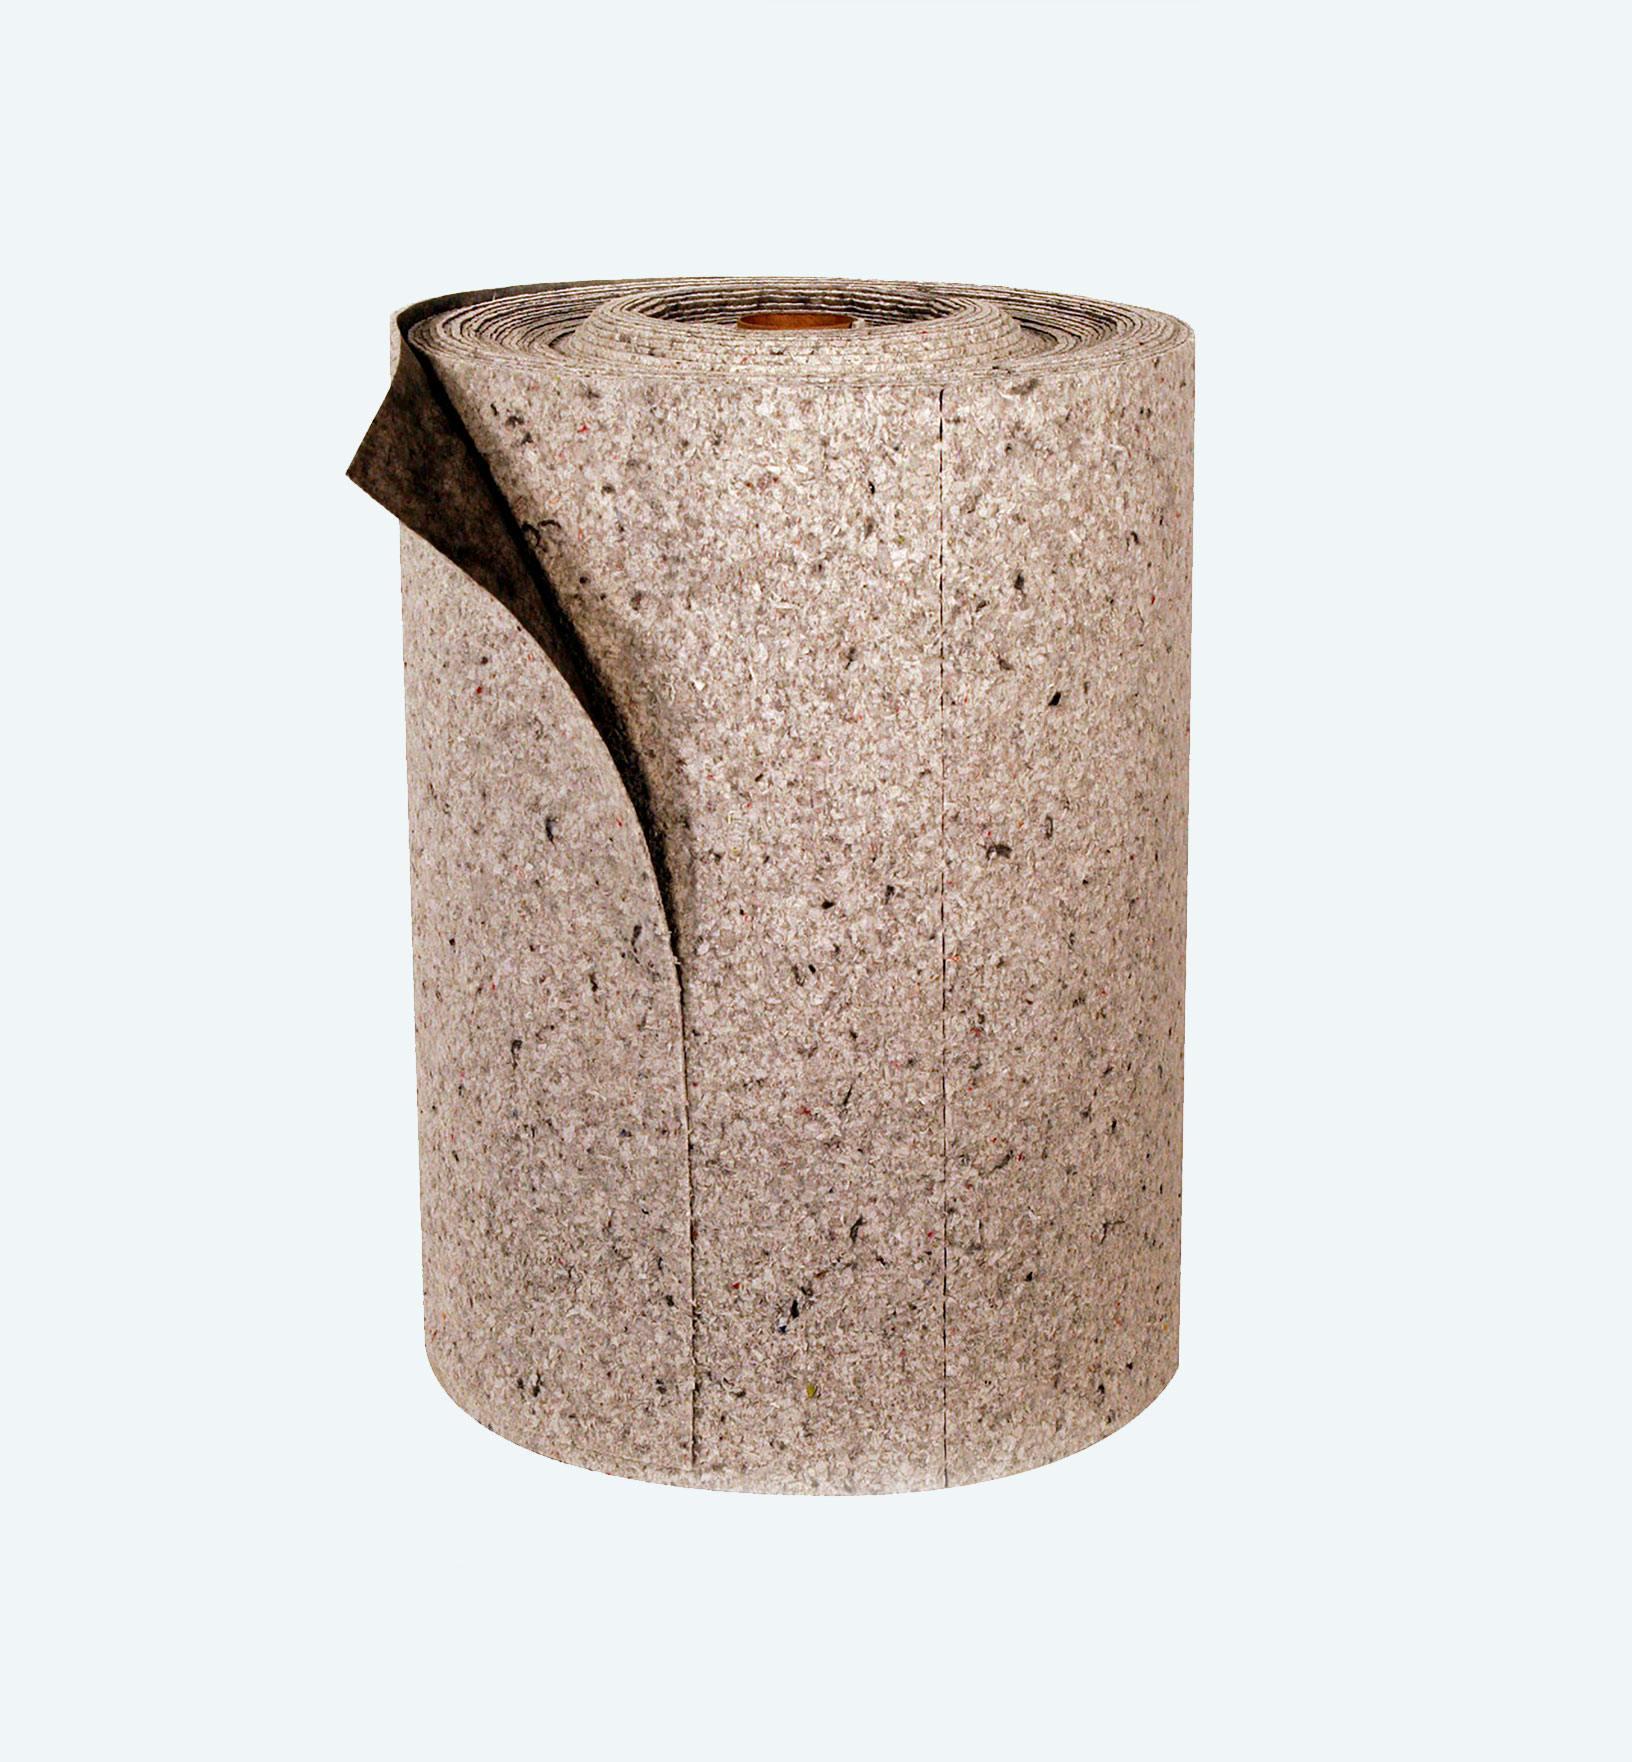 debarasare-mobila-ambalaje-reciclabile